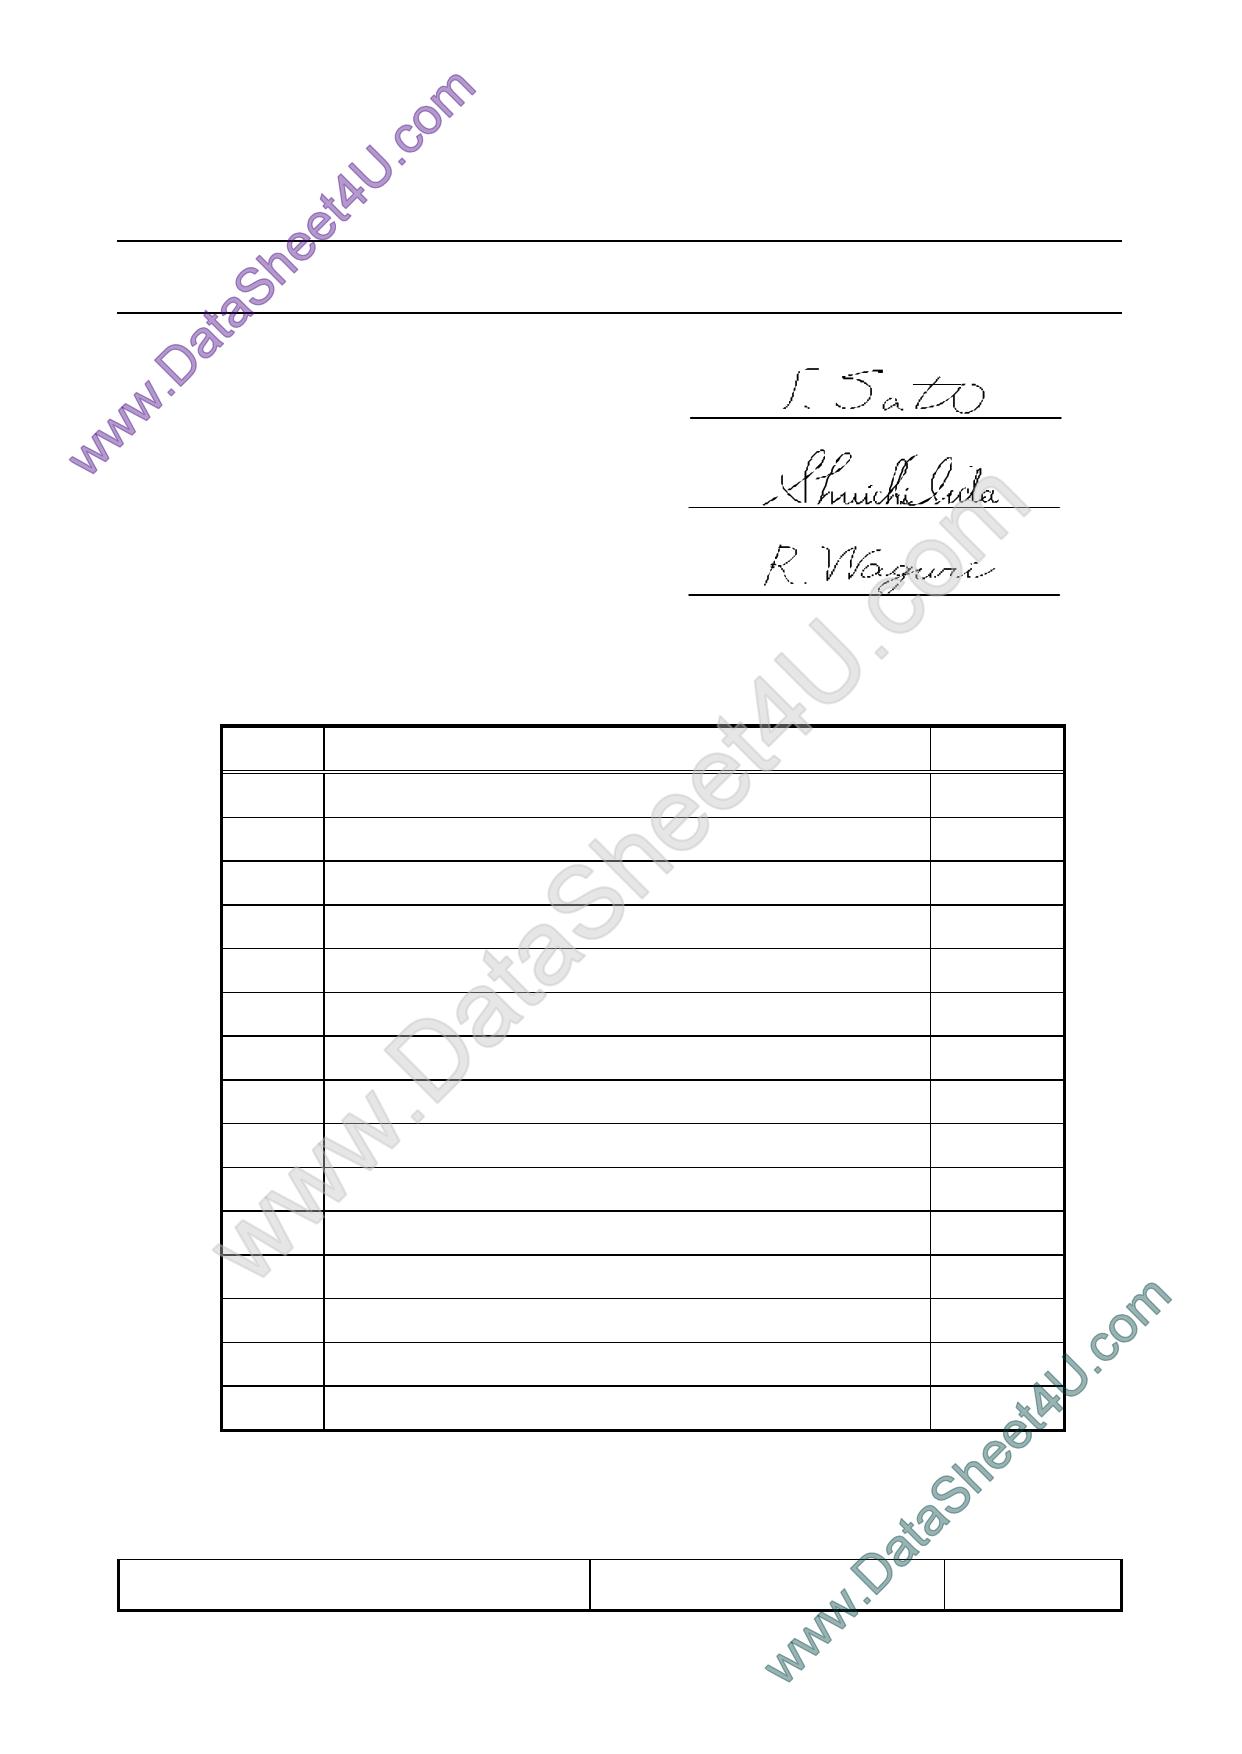 T-51513D104J-FW_A_AD datasheet